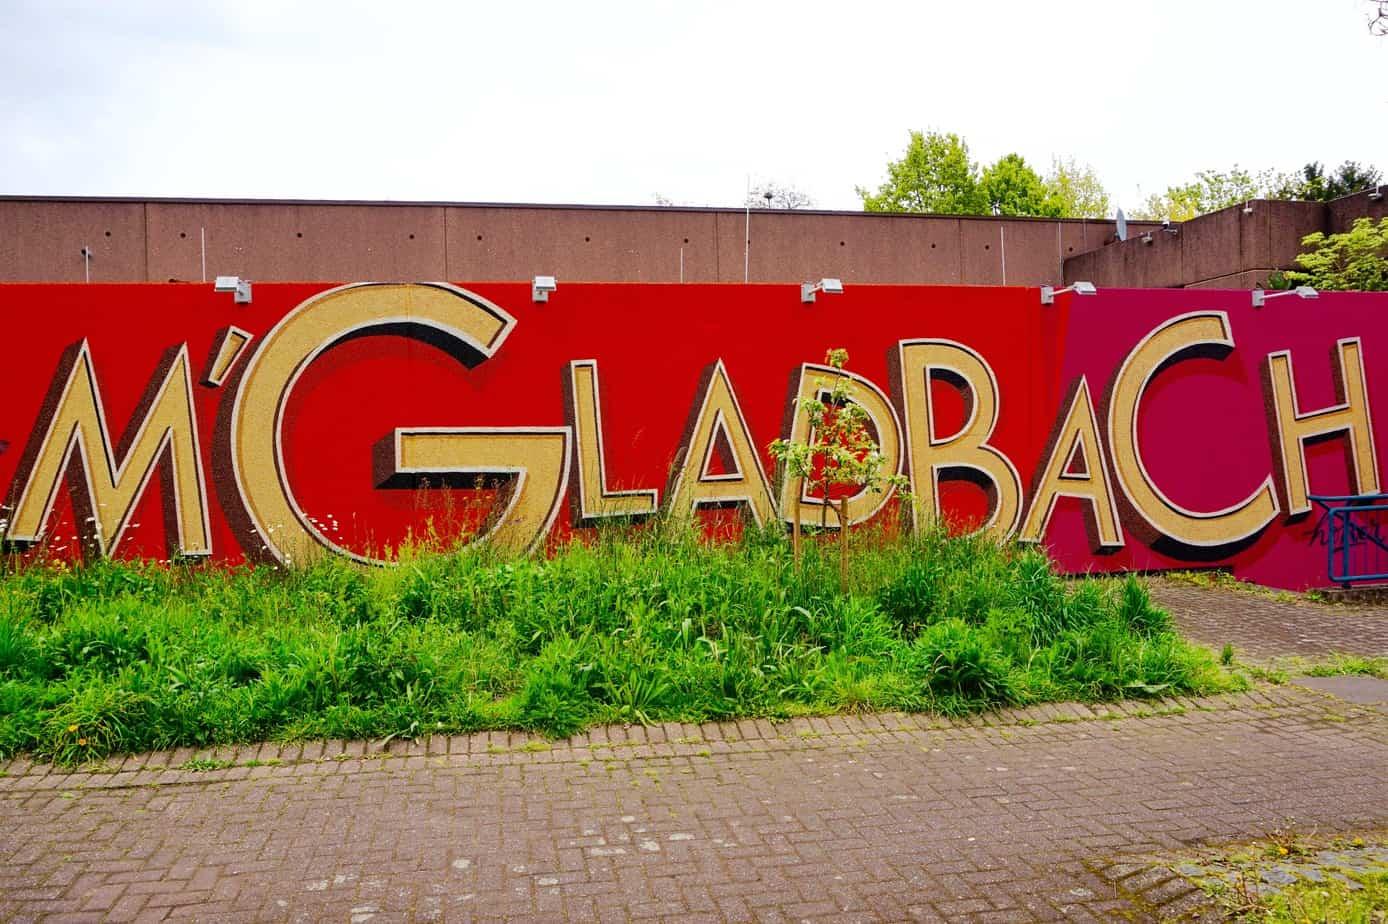 Mönchengladbach Titelbild, Graffiti, Rot, Schulwand